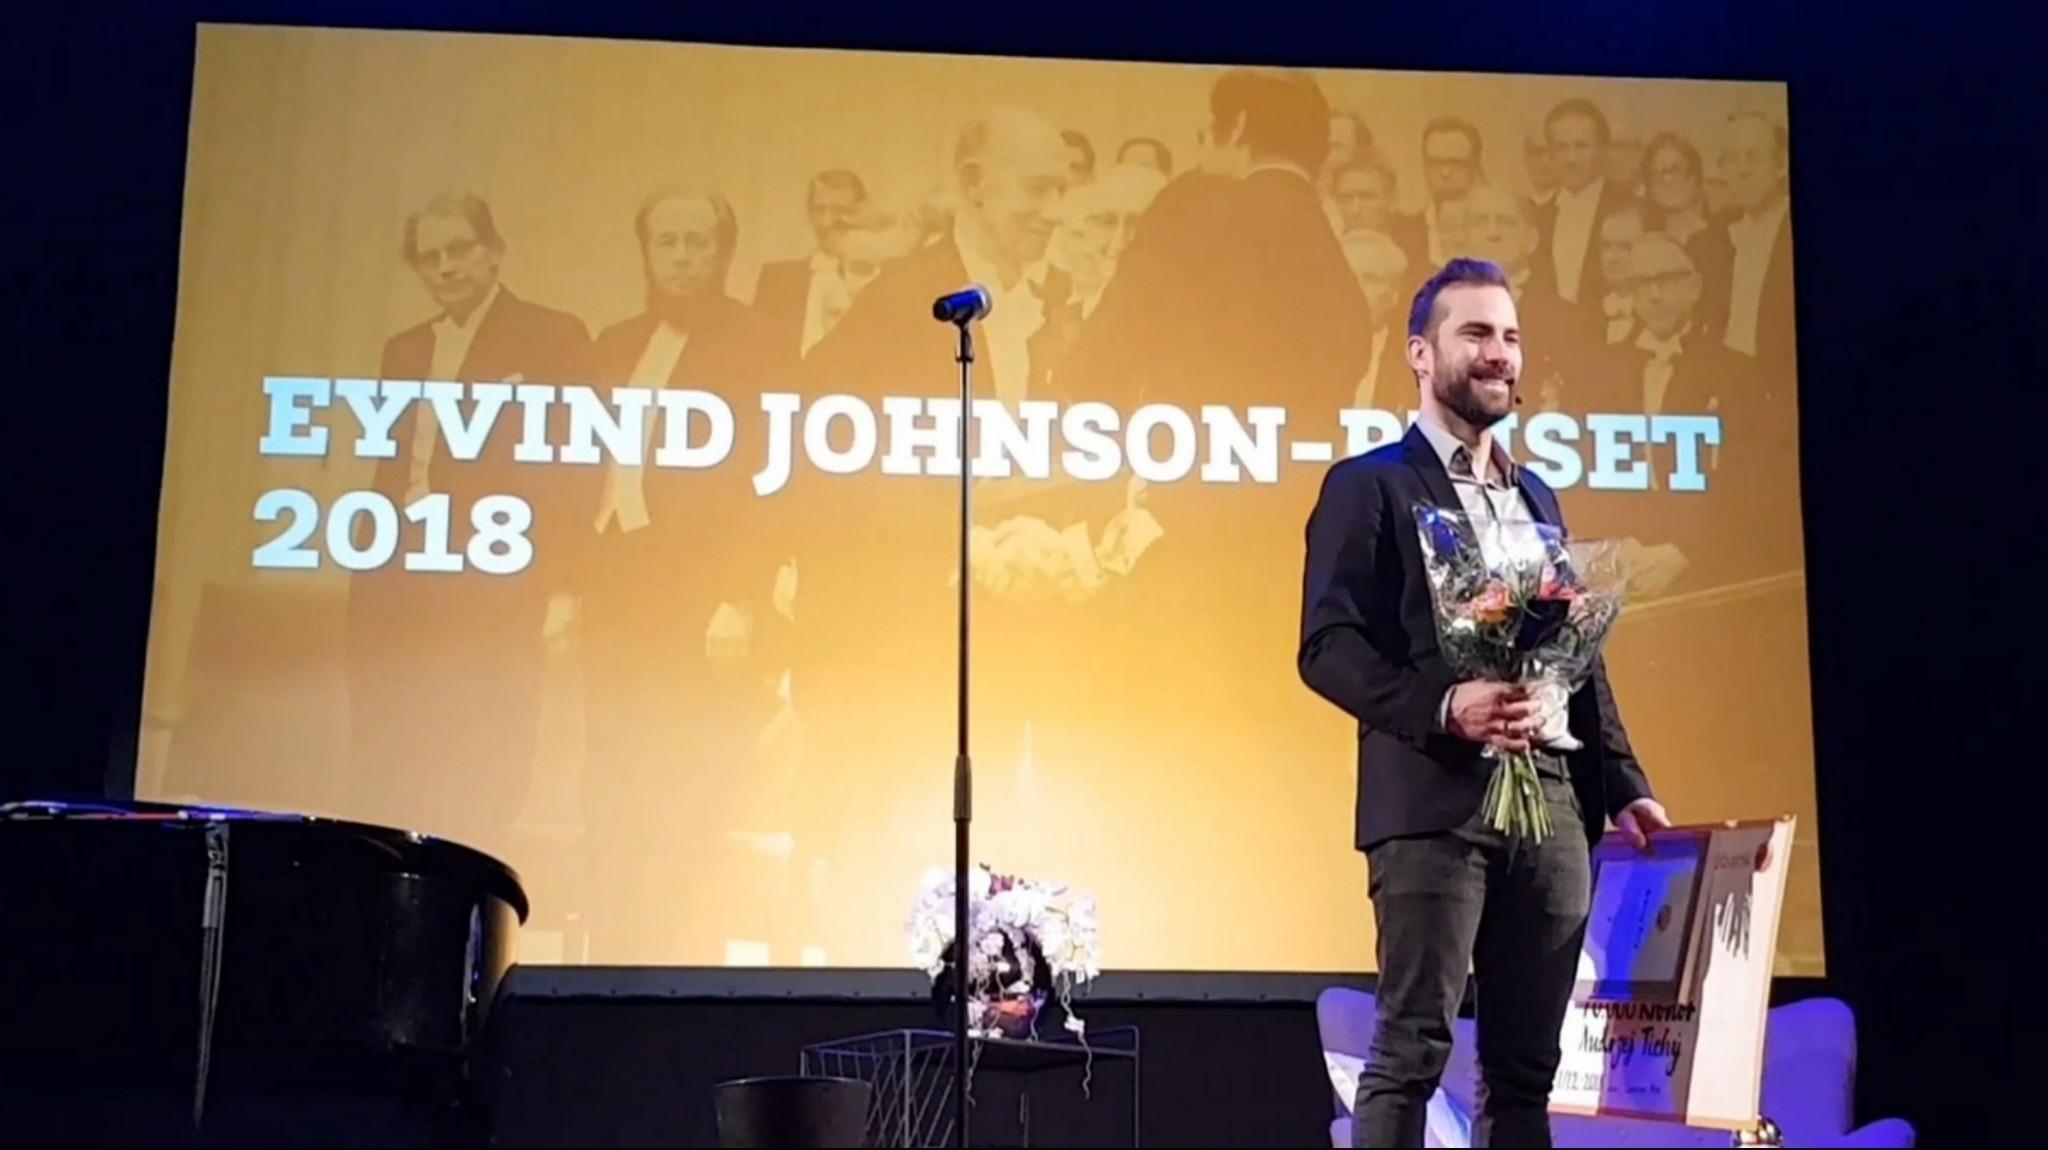 Pristagare Eyvind Johnson-priset i litteratur 2018